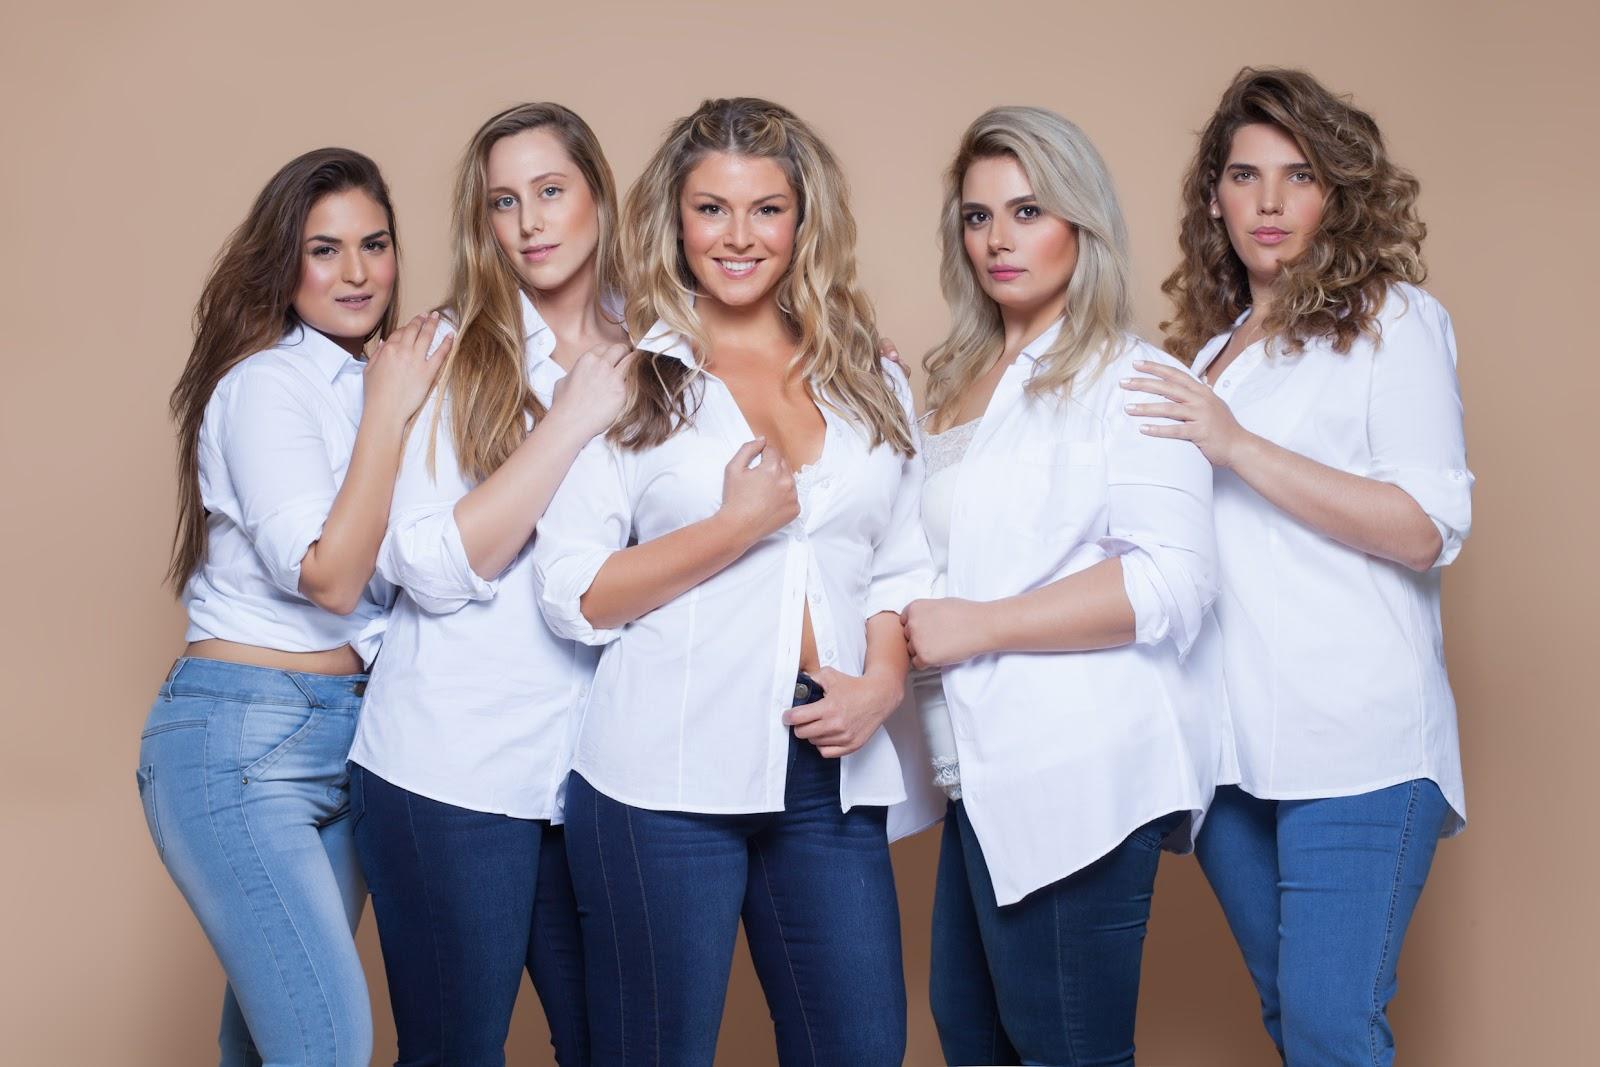 ml women ג'ינסים מחיר החל מ- 129.90 שח חולצה 149.90 שח צילום אריאל בלק.jpg